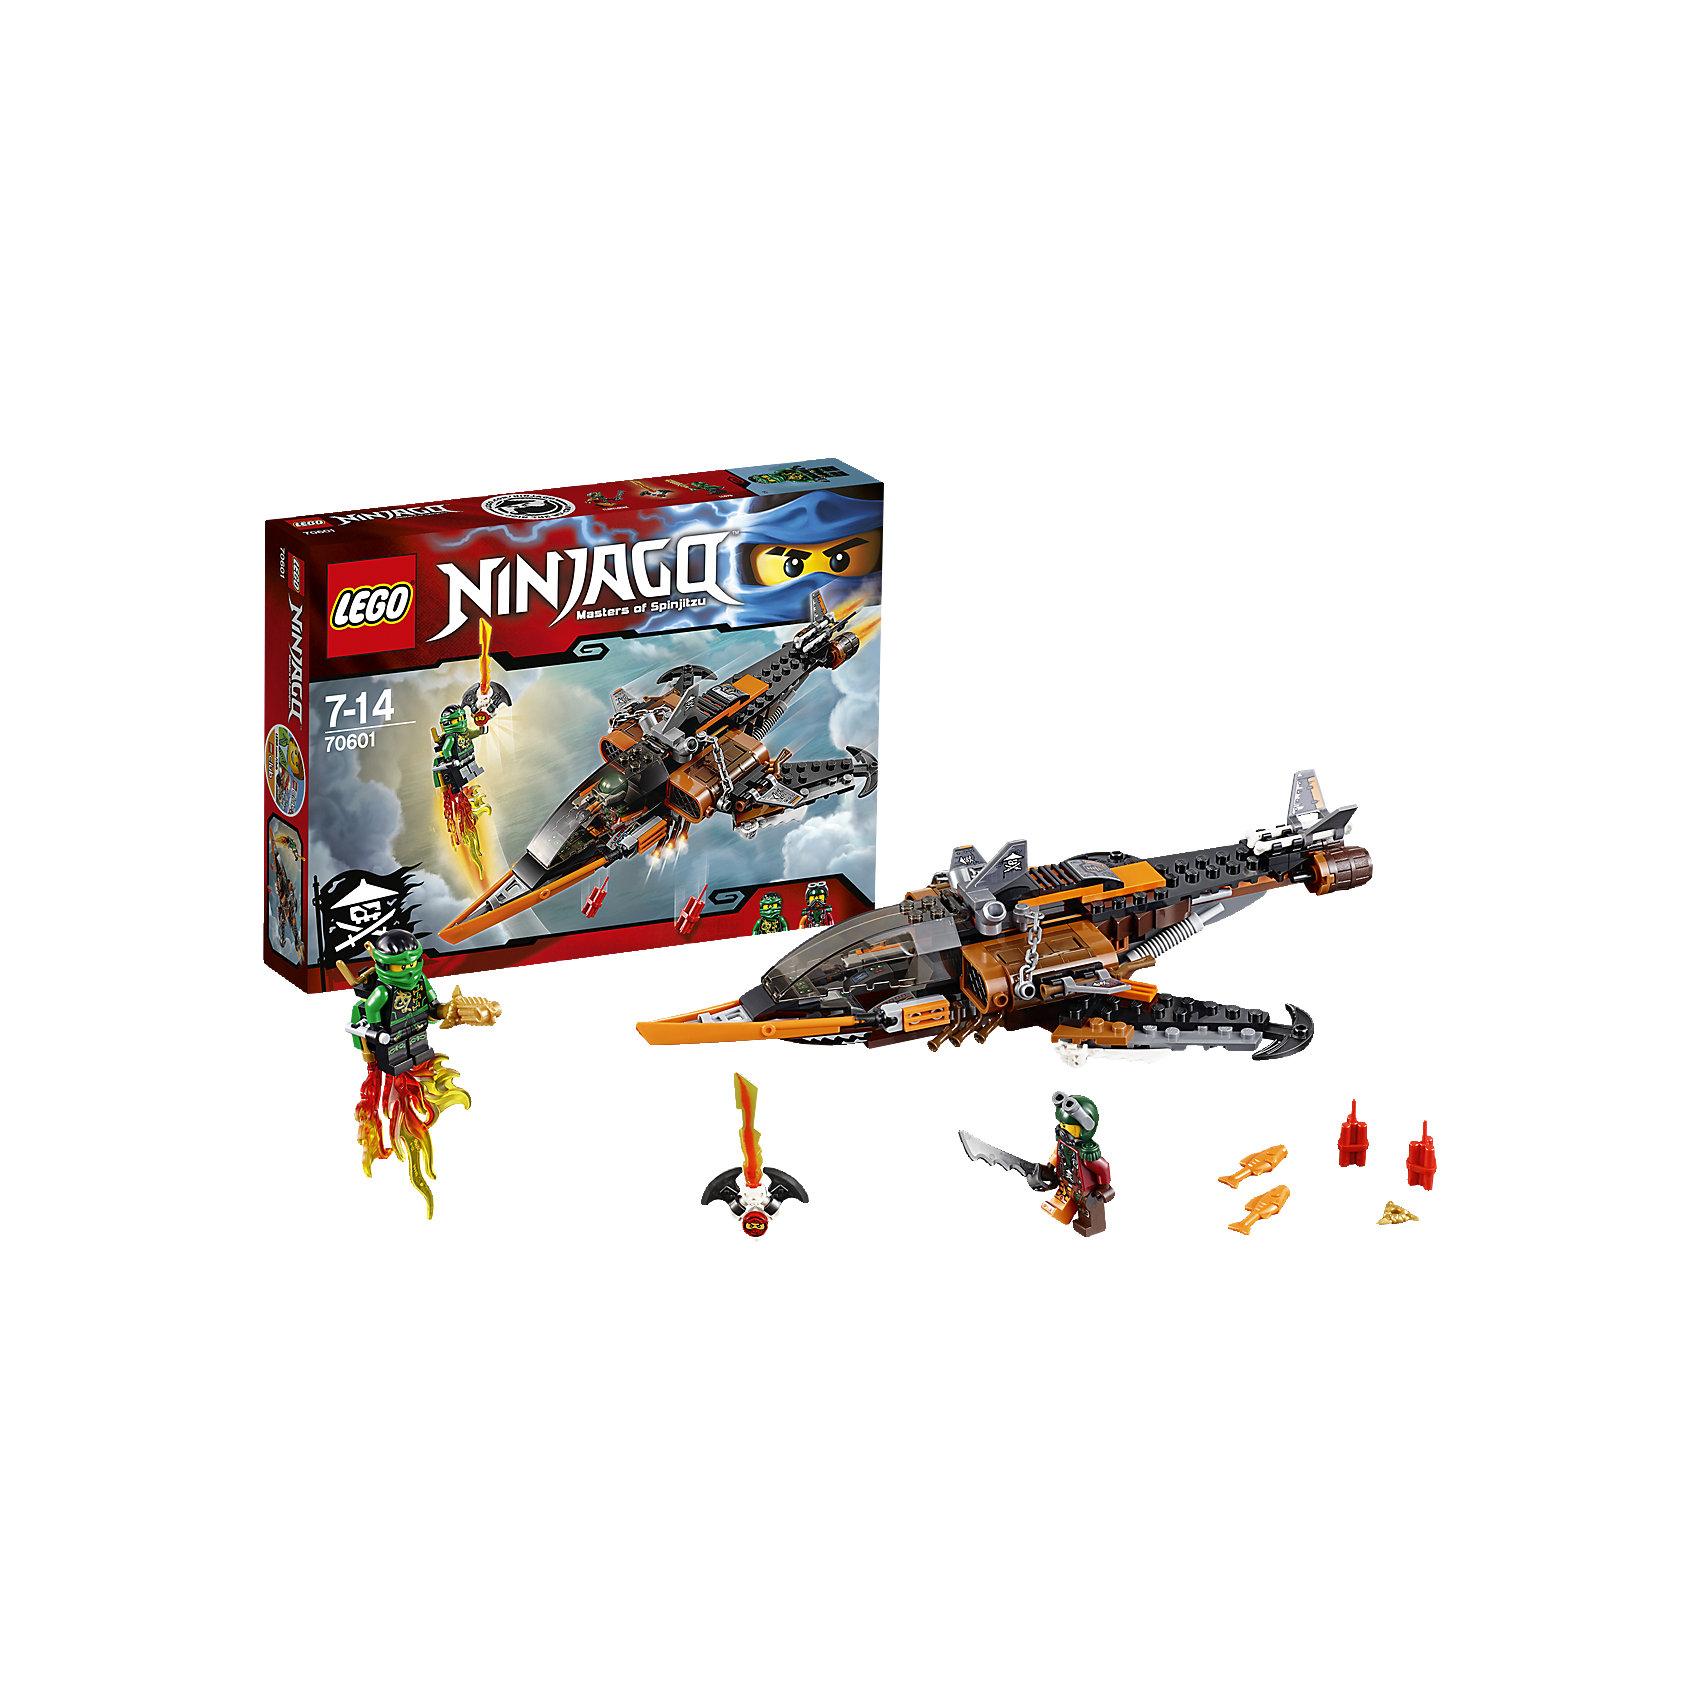 LEGO LEGO NINJAGO 70601: Небесная акула